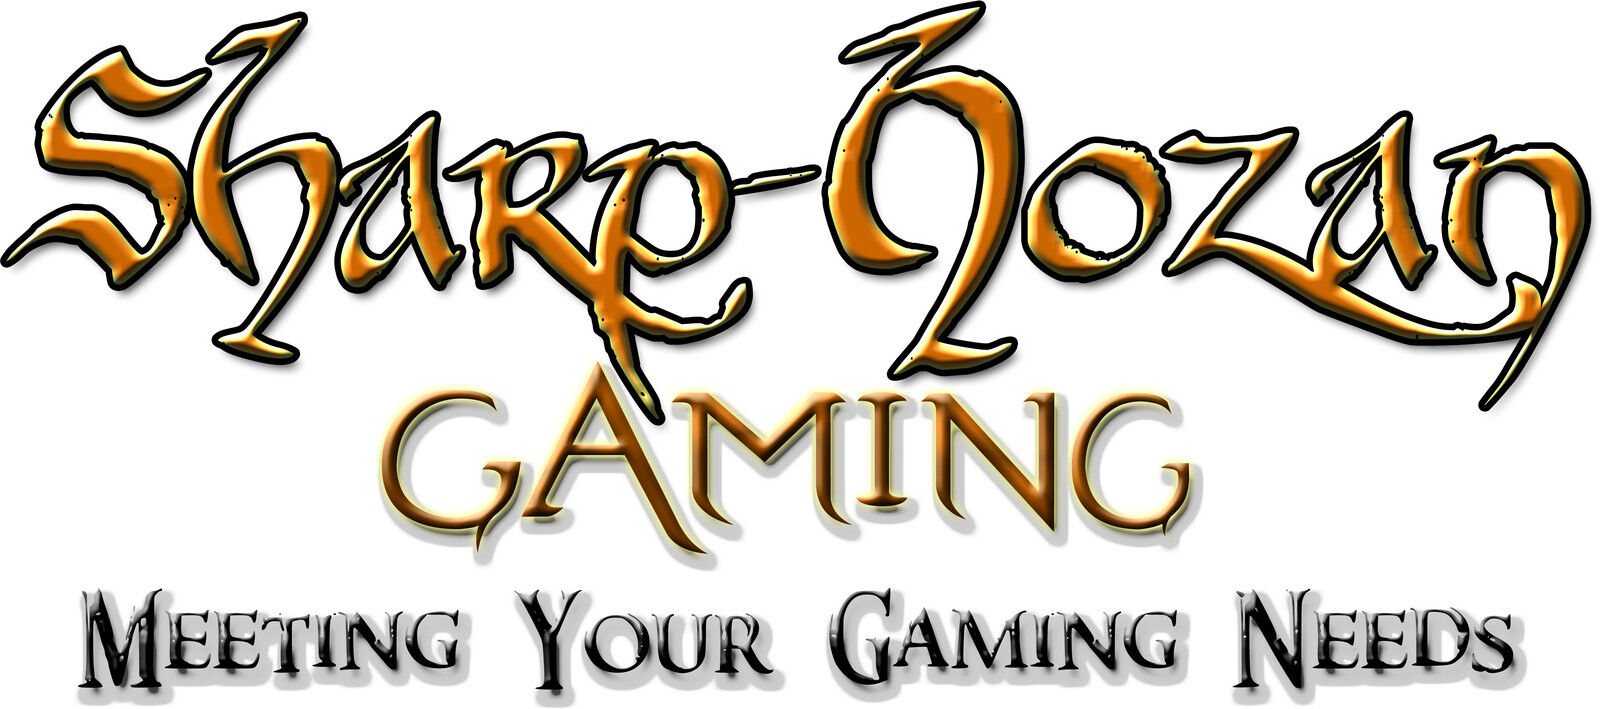 Sharp Hozan Gaming